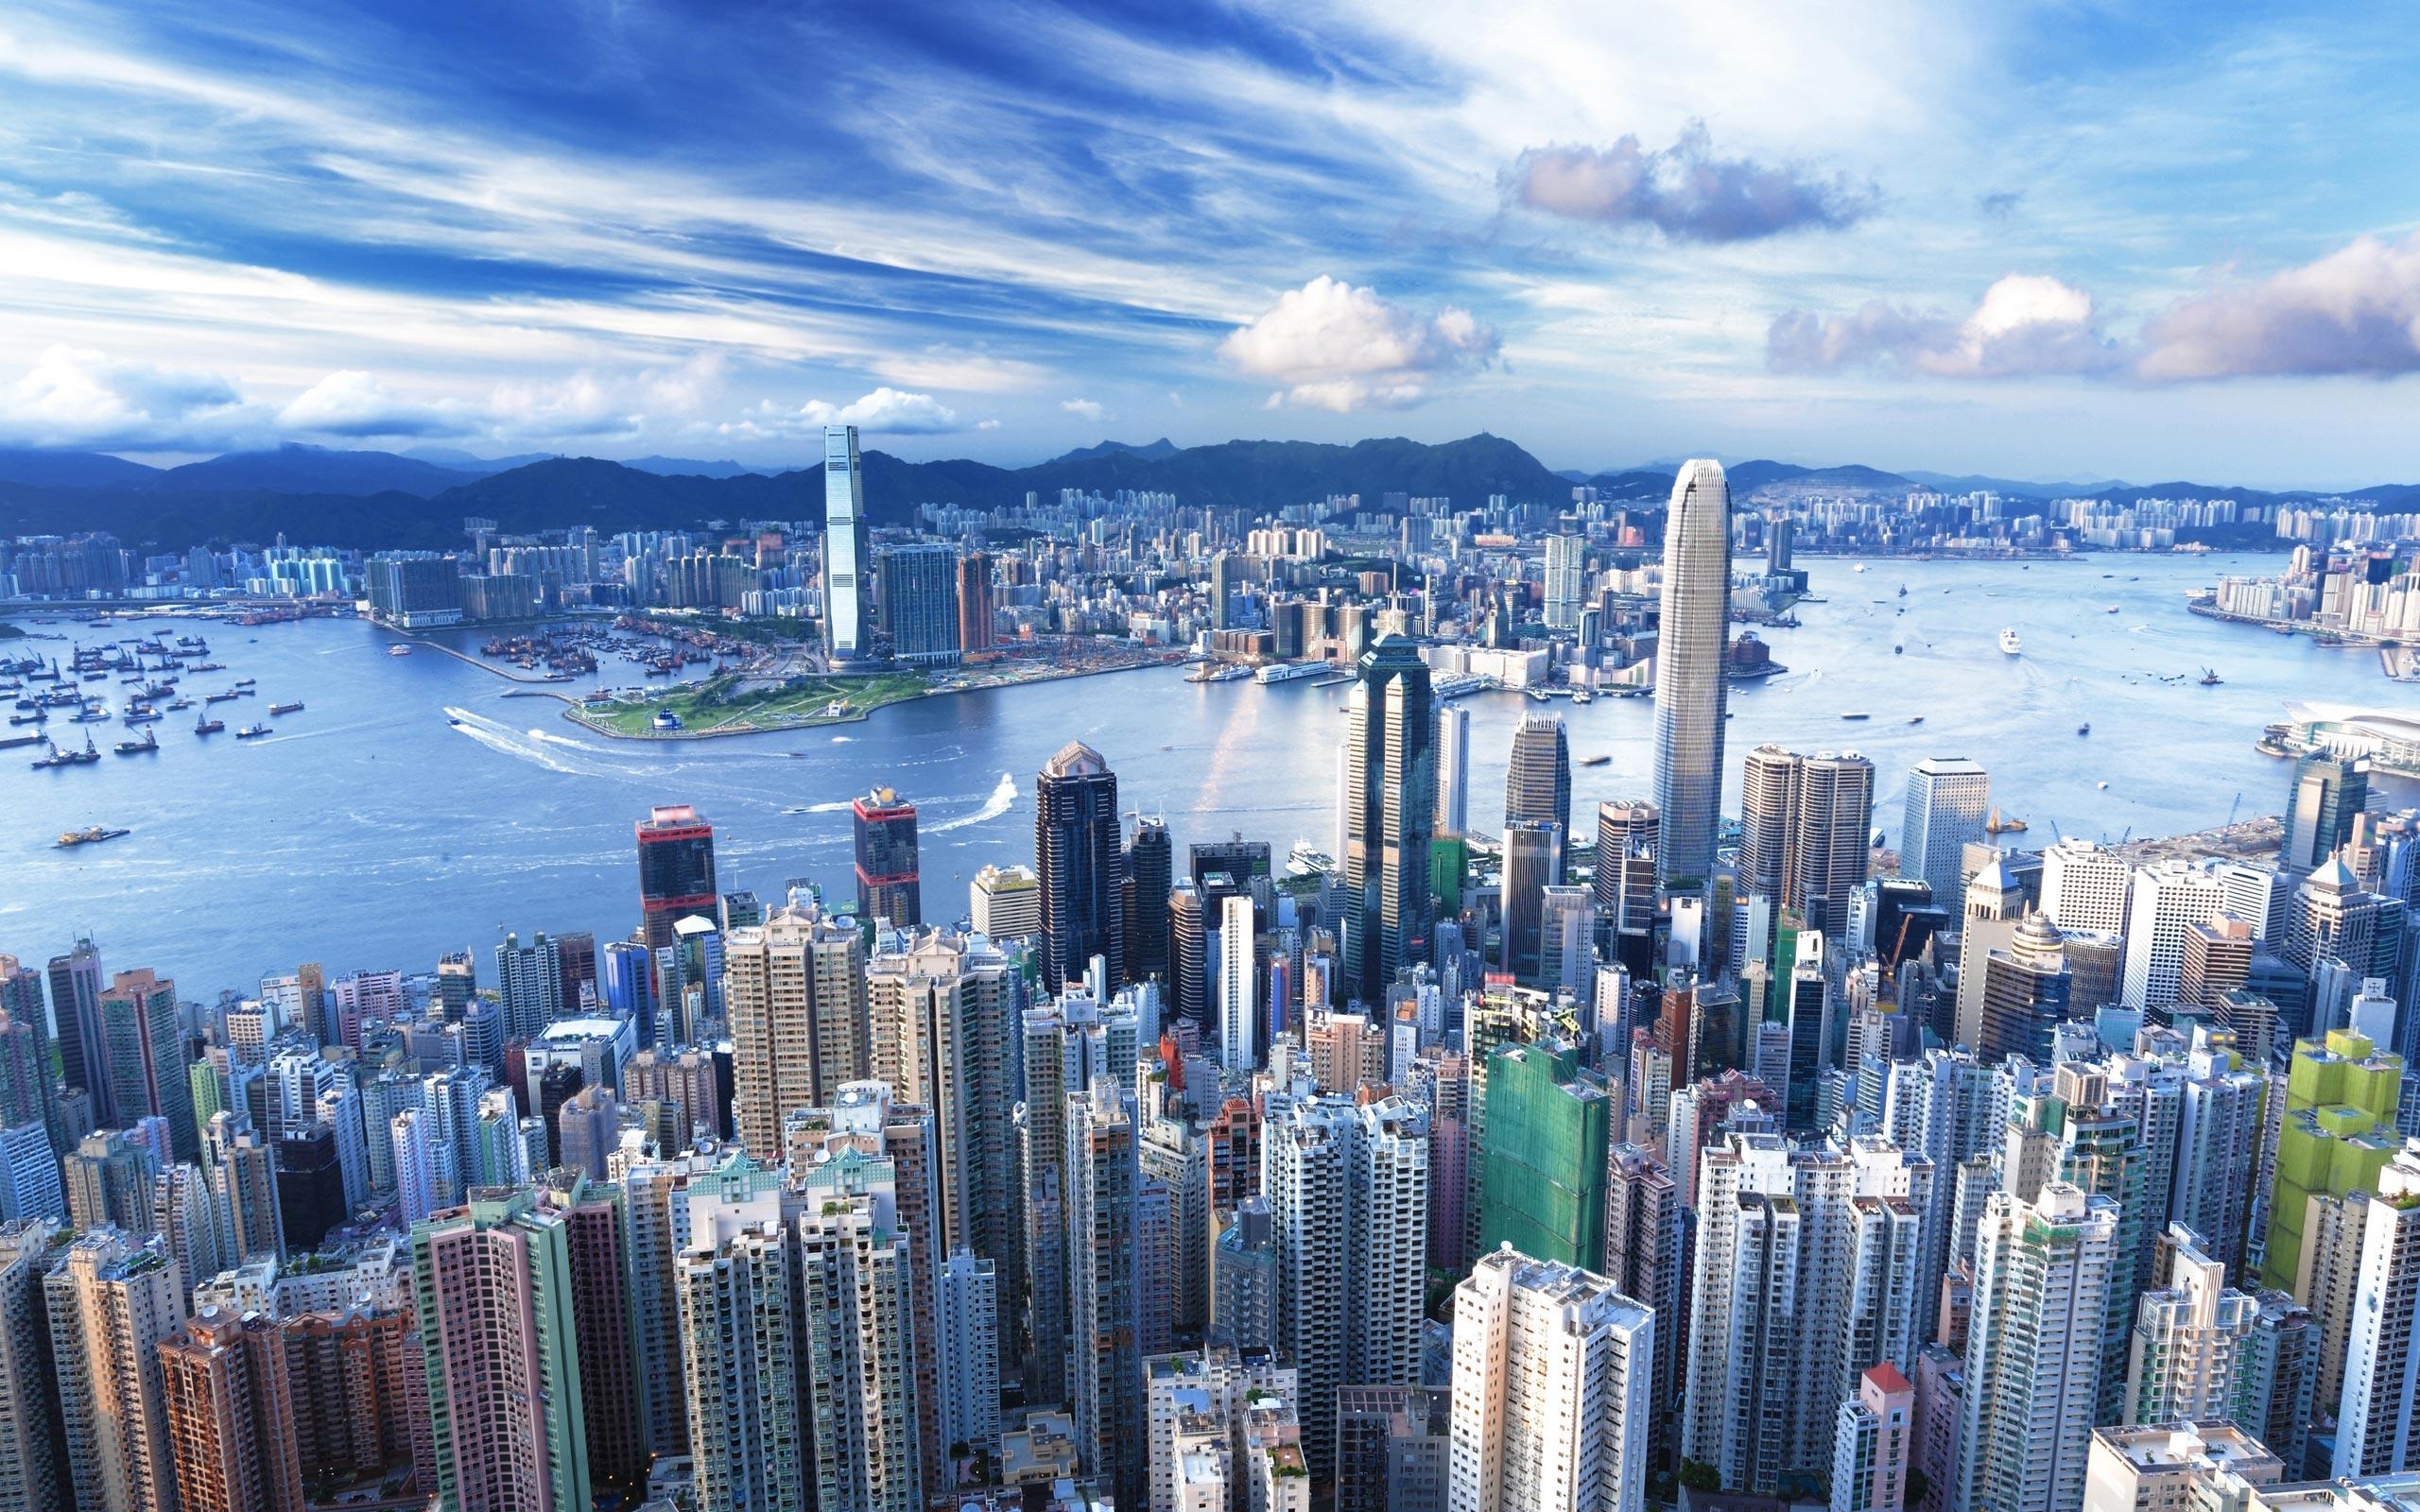 HONGKONG & MACAU FUSION